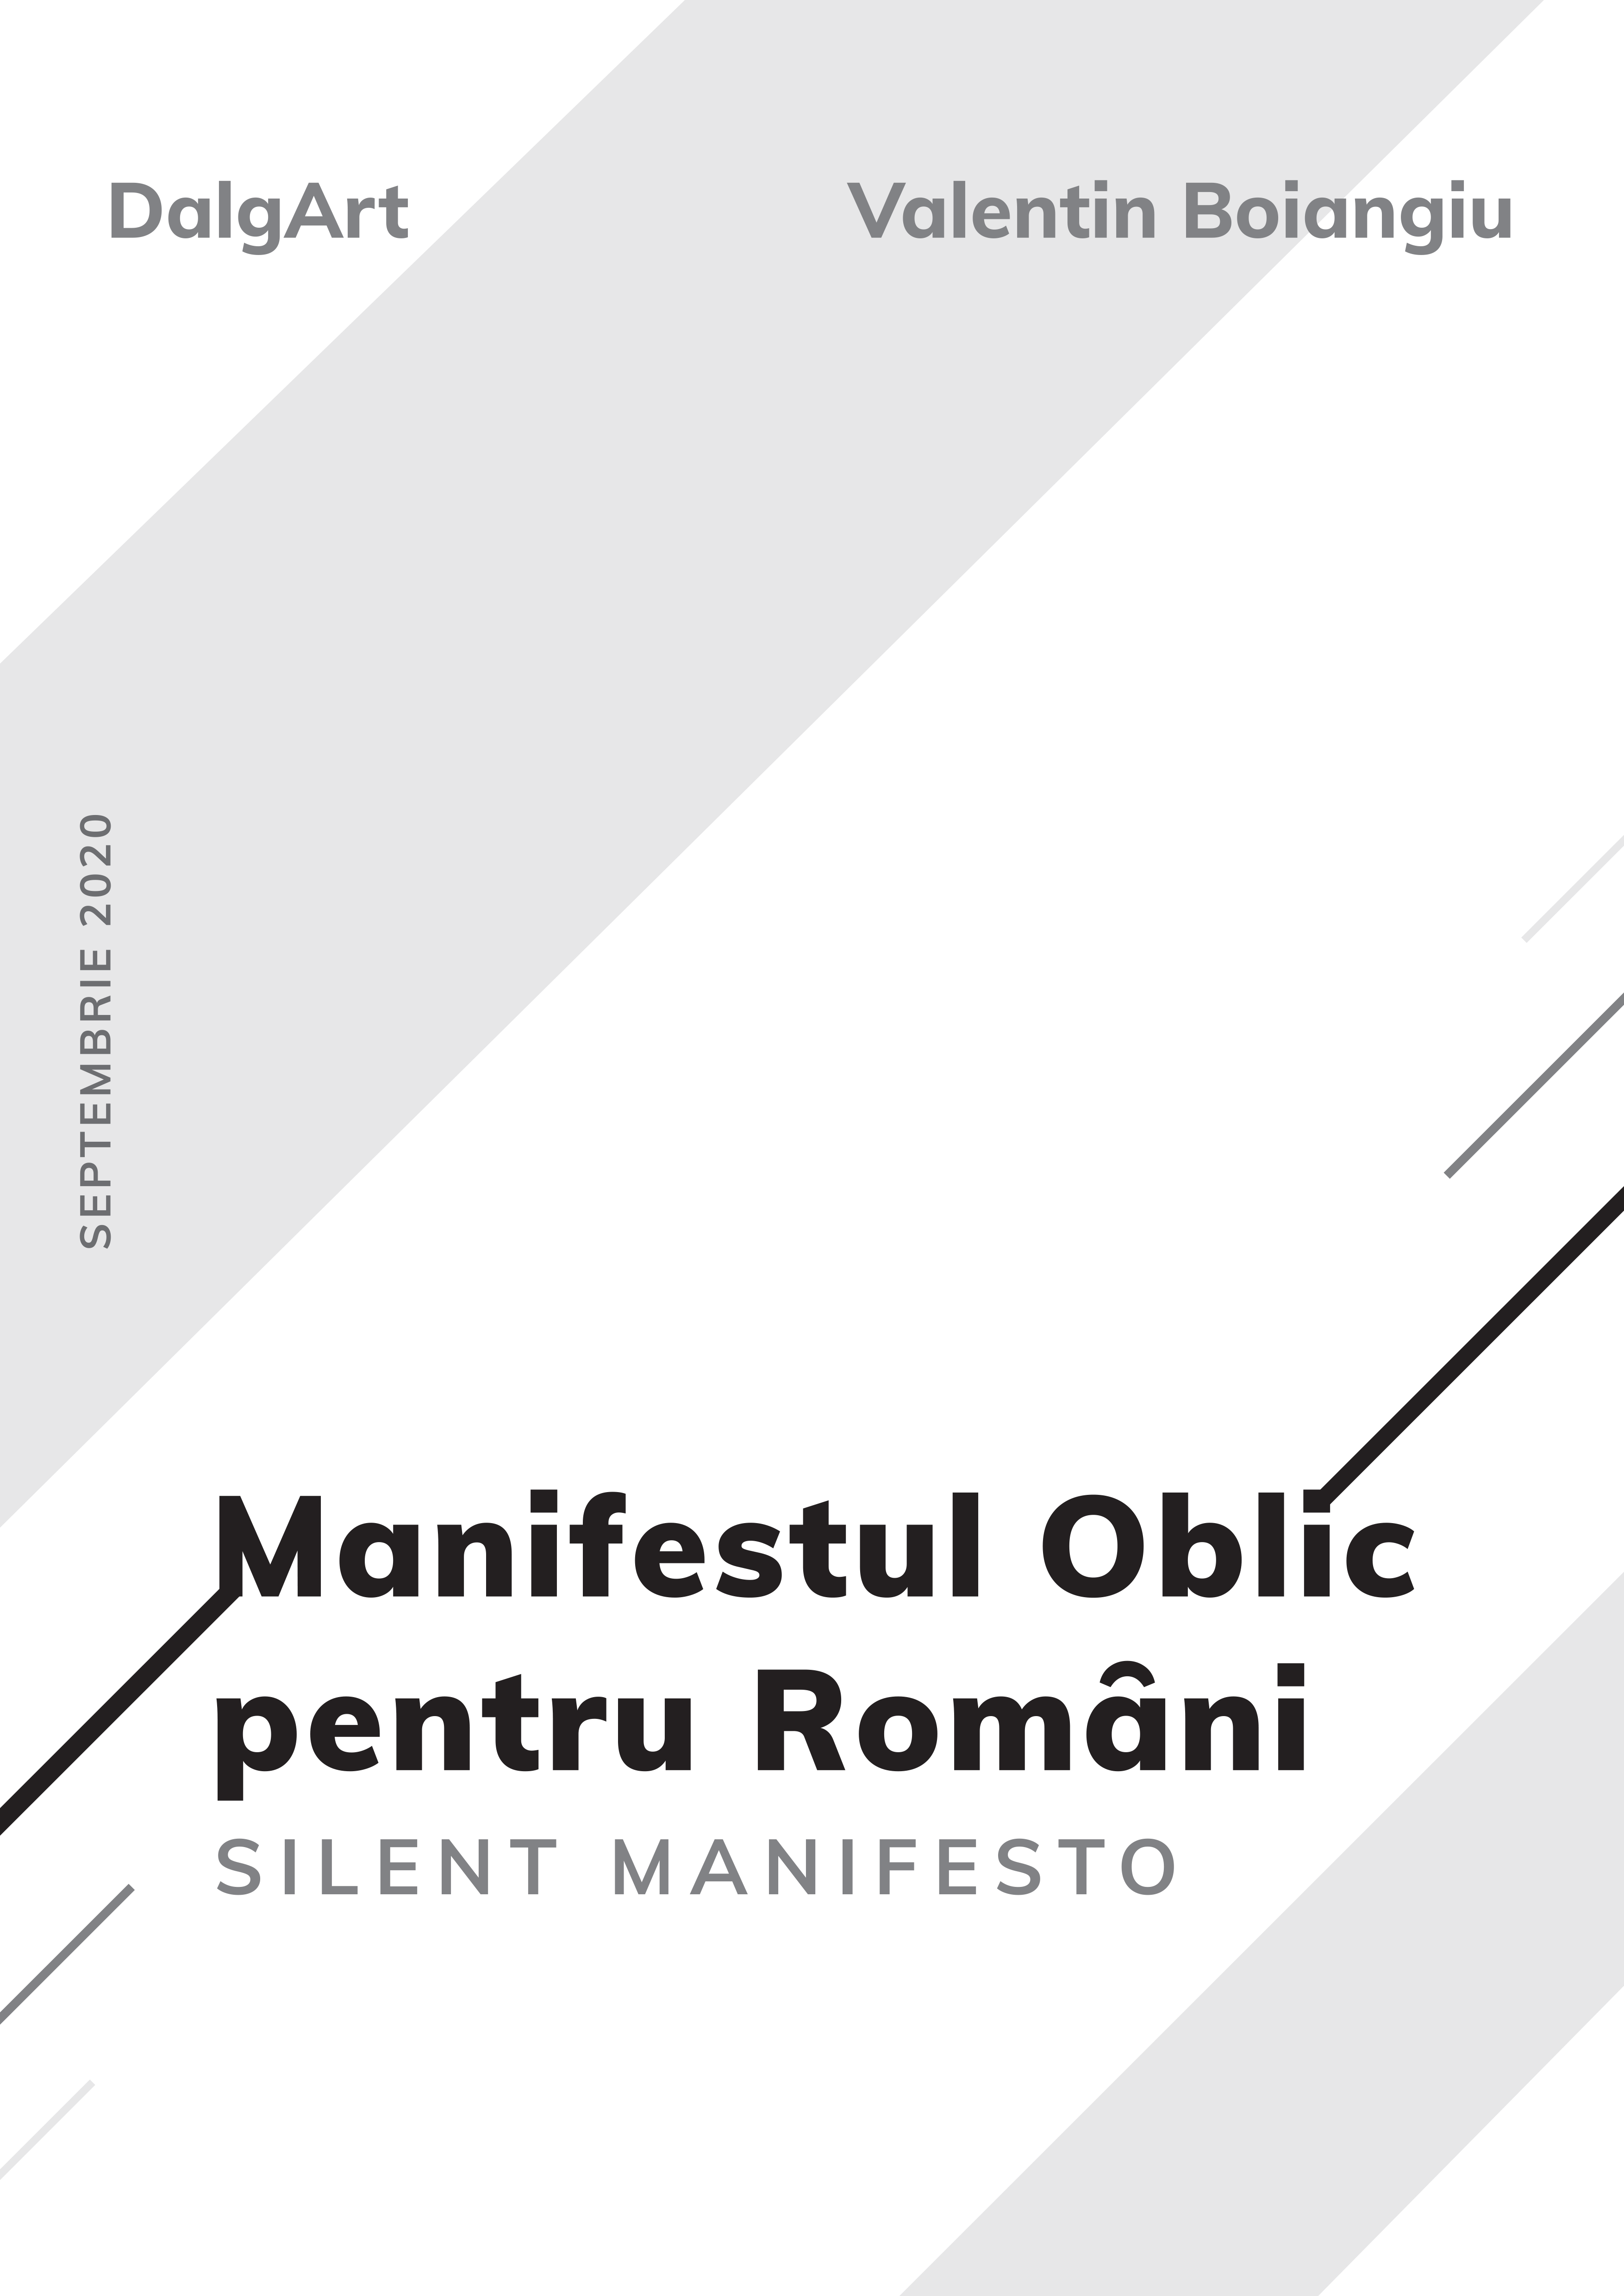 manifestul-01-2